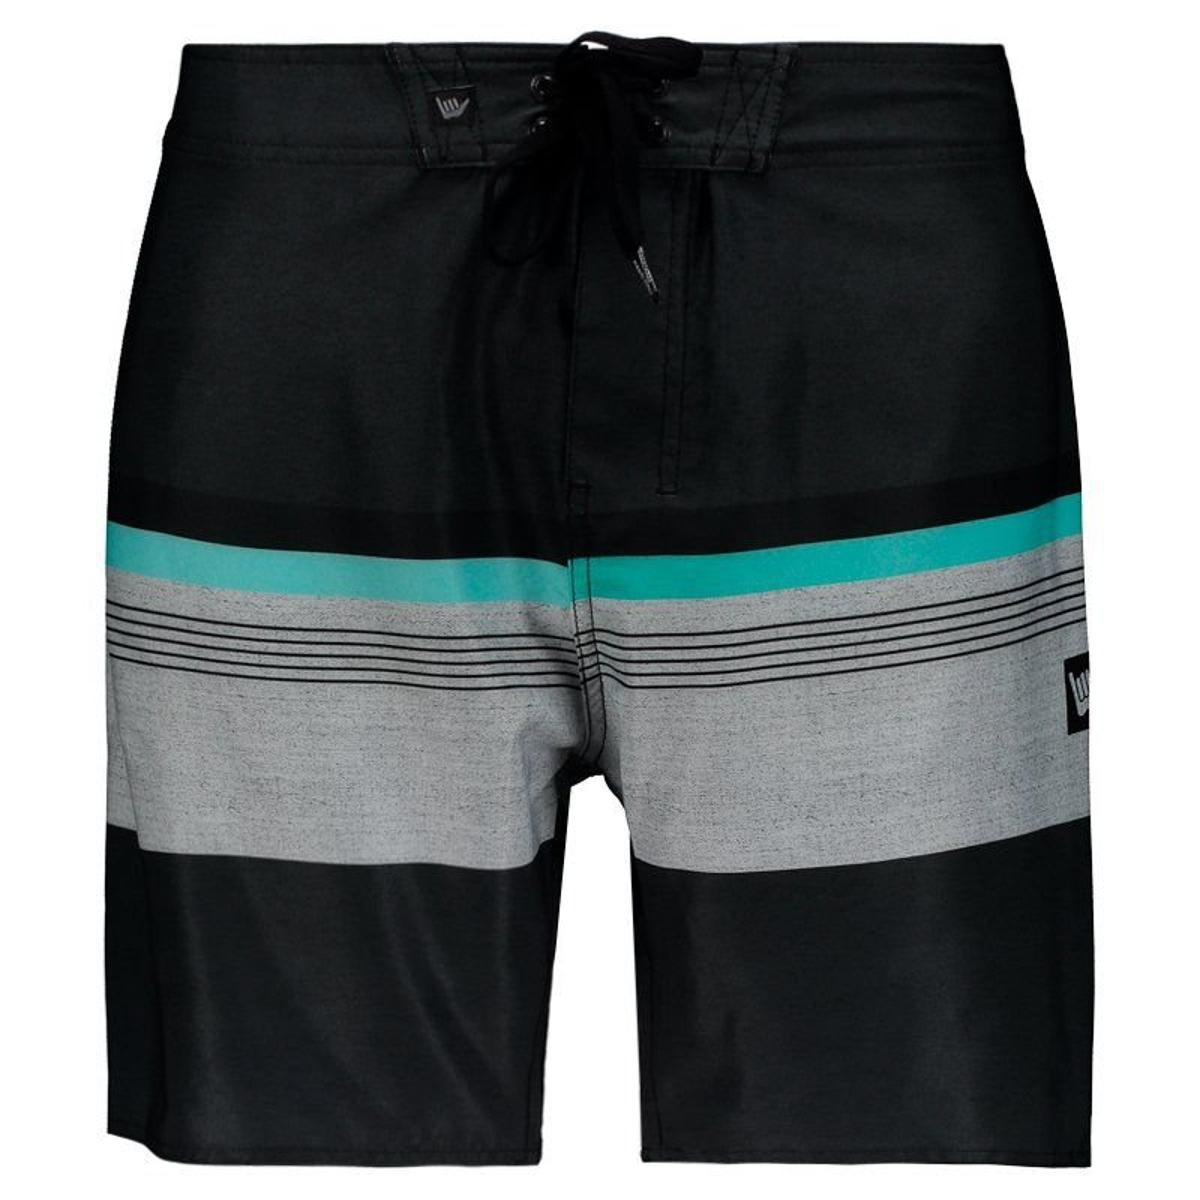 Bermuda Hang Loose Hue Masculina - Preto - Compre Agora  76f54be15e3be